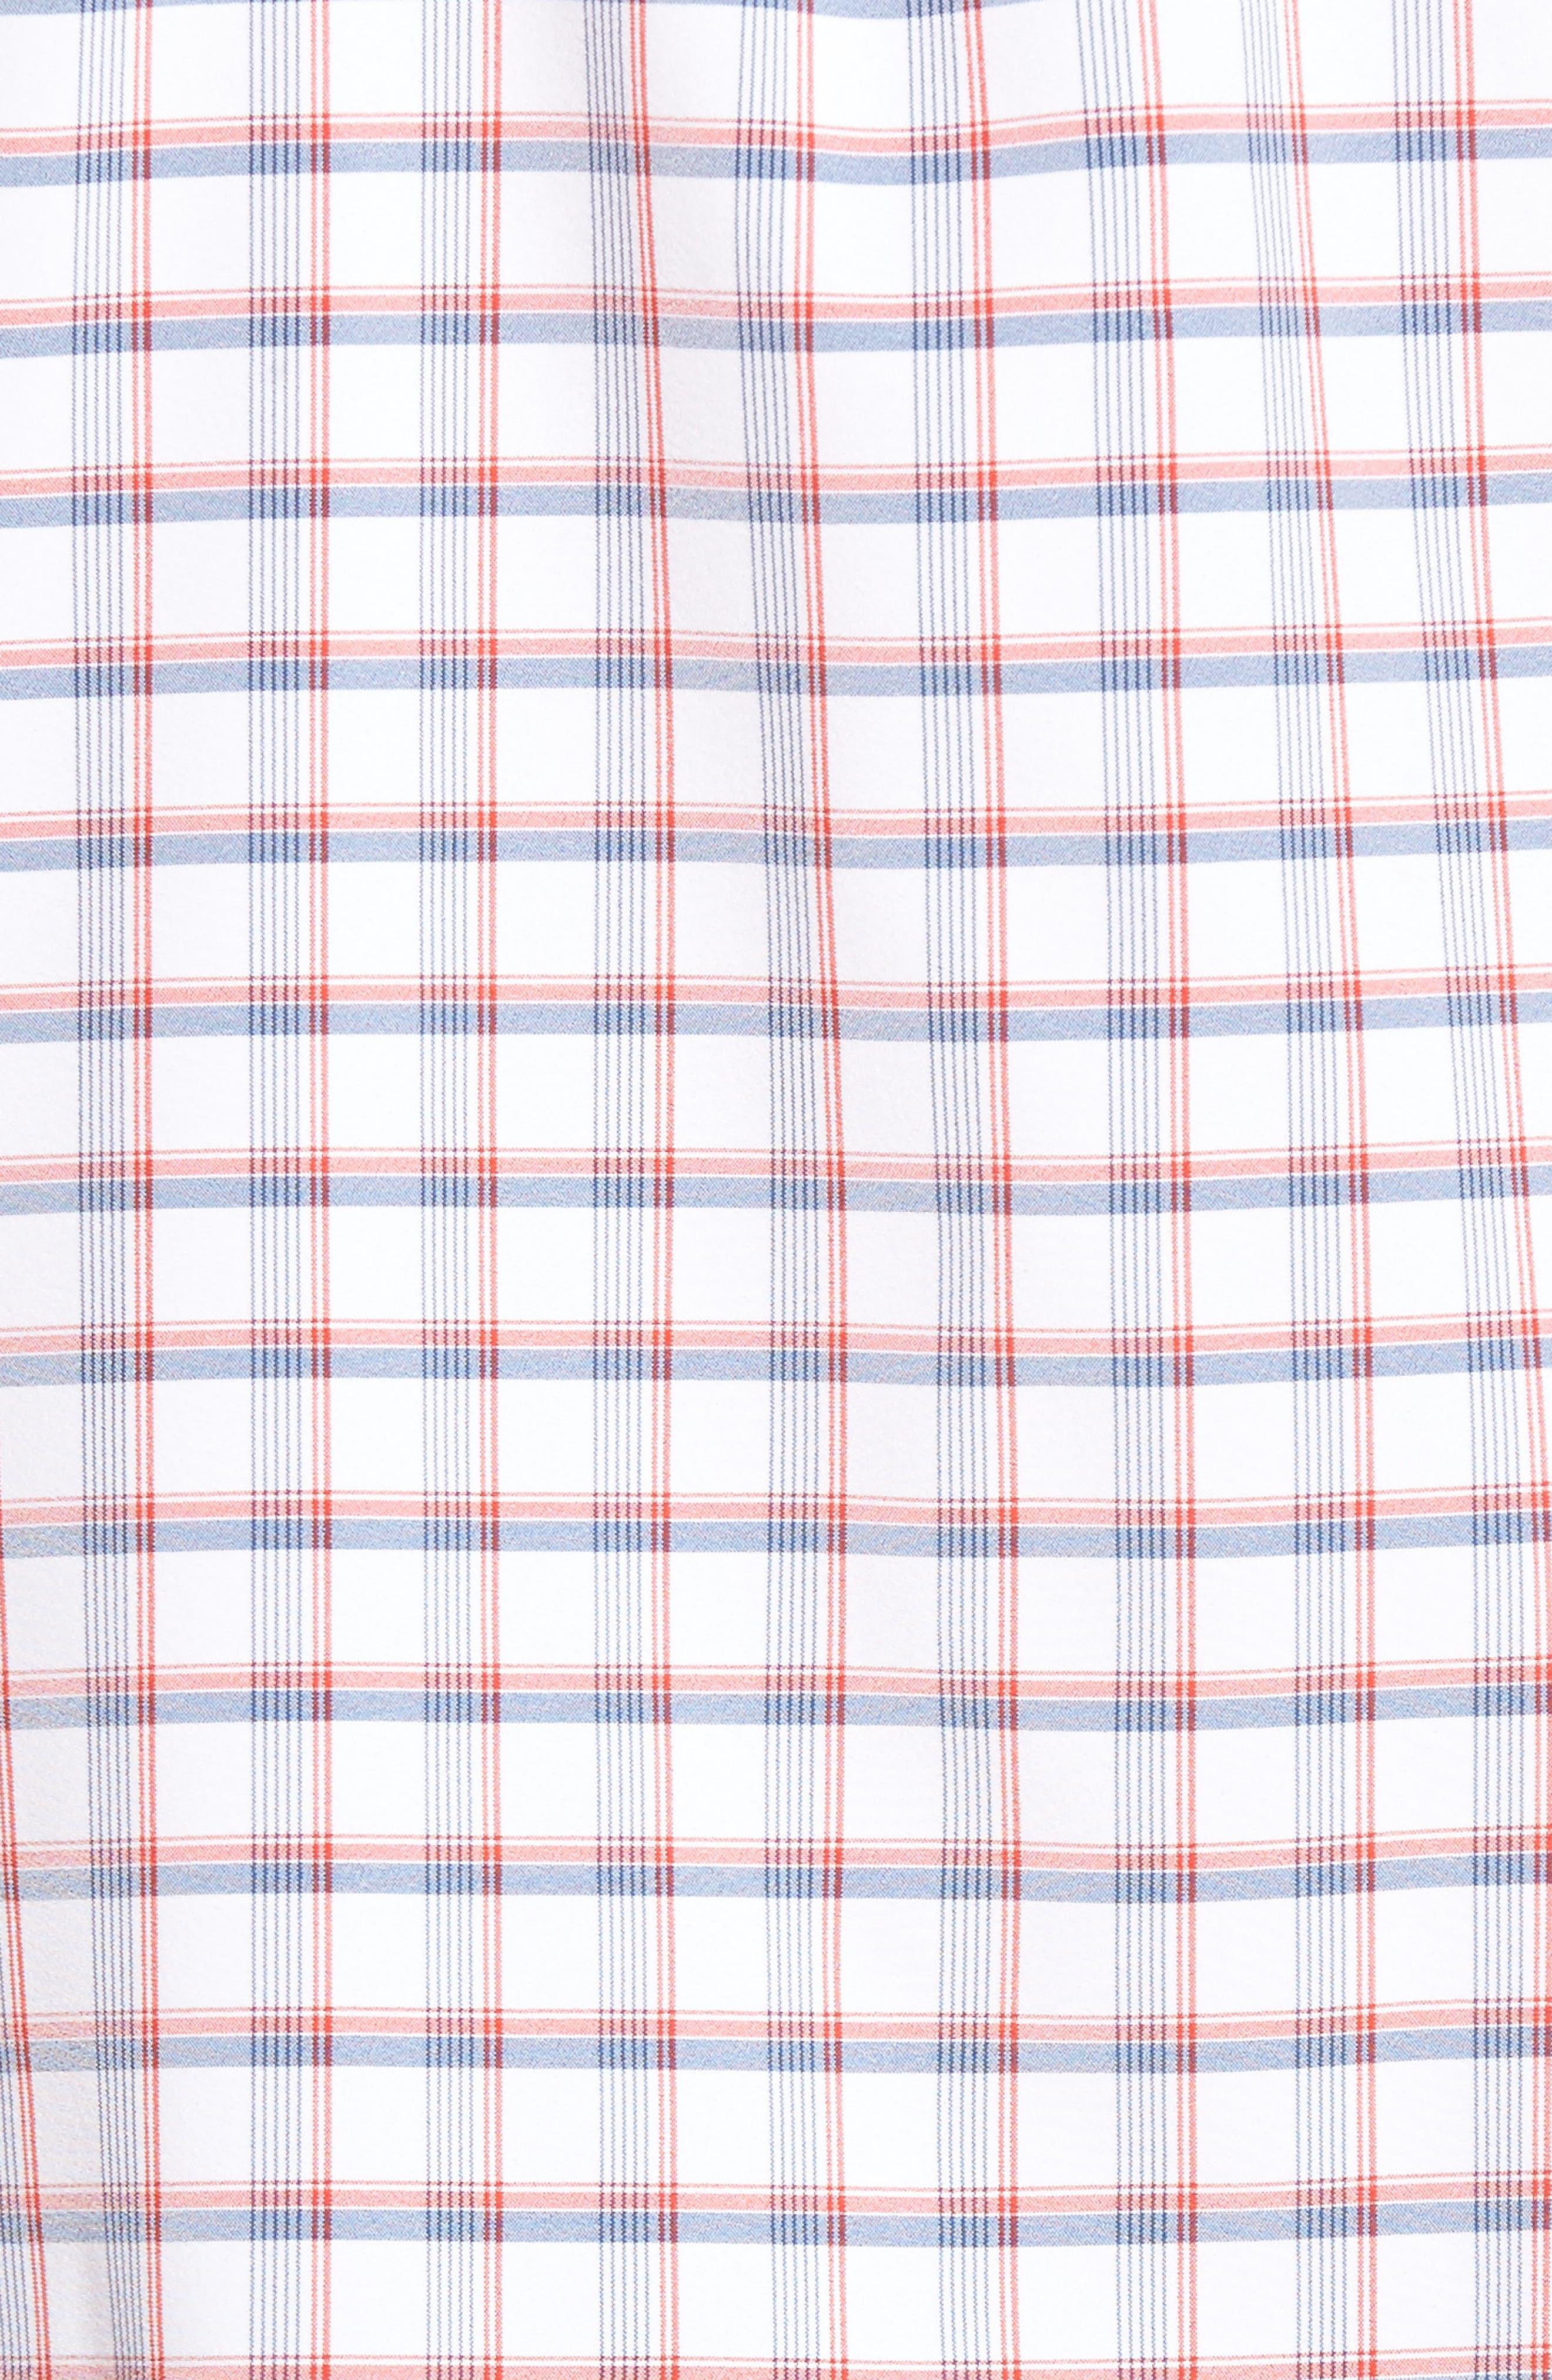 Sanford Slim Fit Plaid Performance Sport Shirt,                             Alternate thumbnail 5, color,                             600